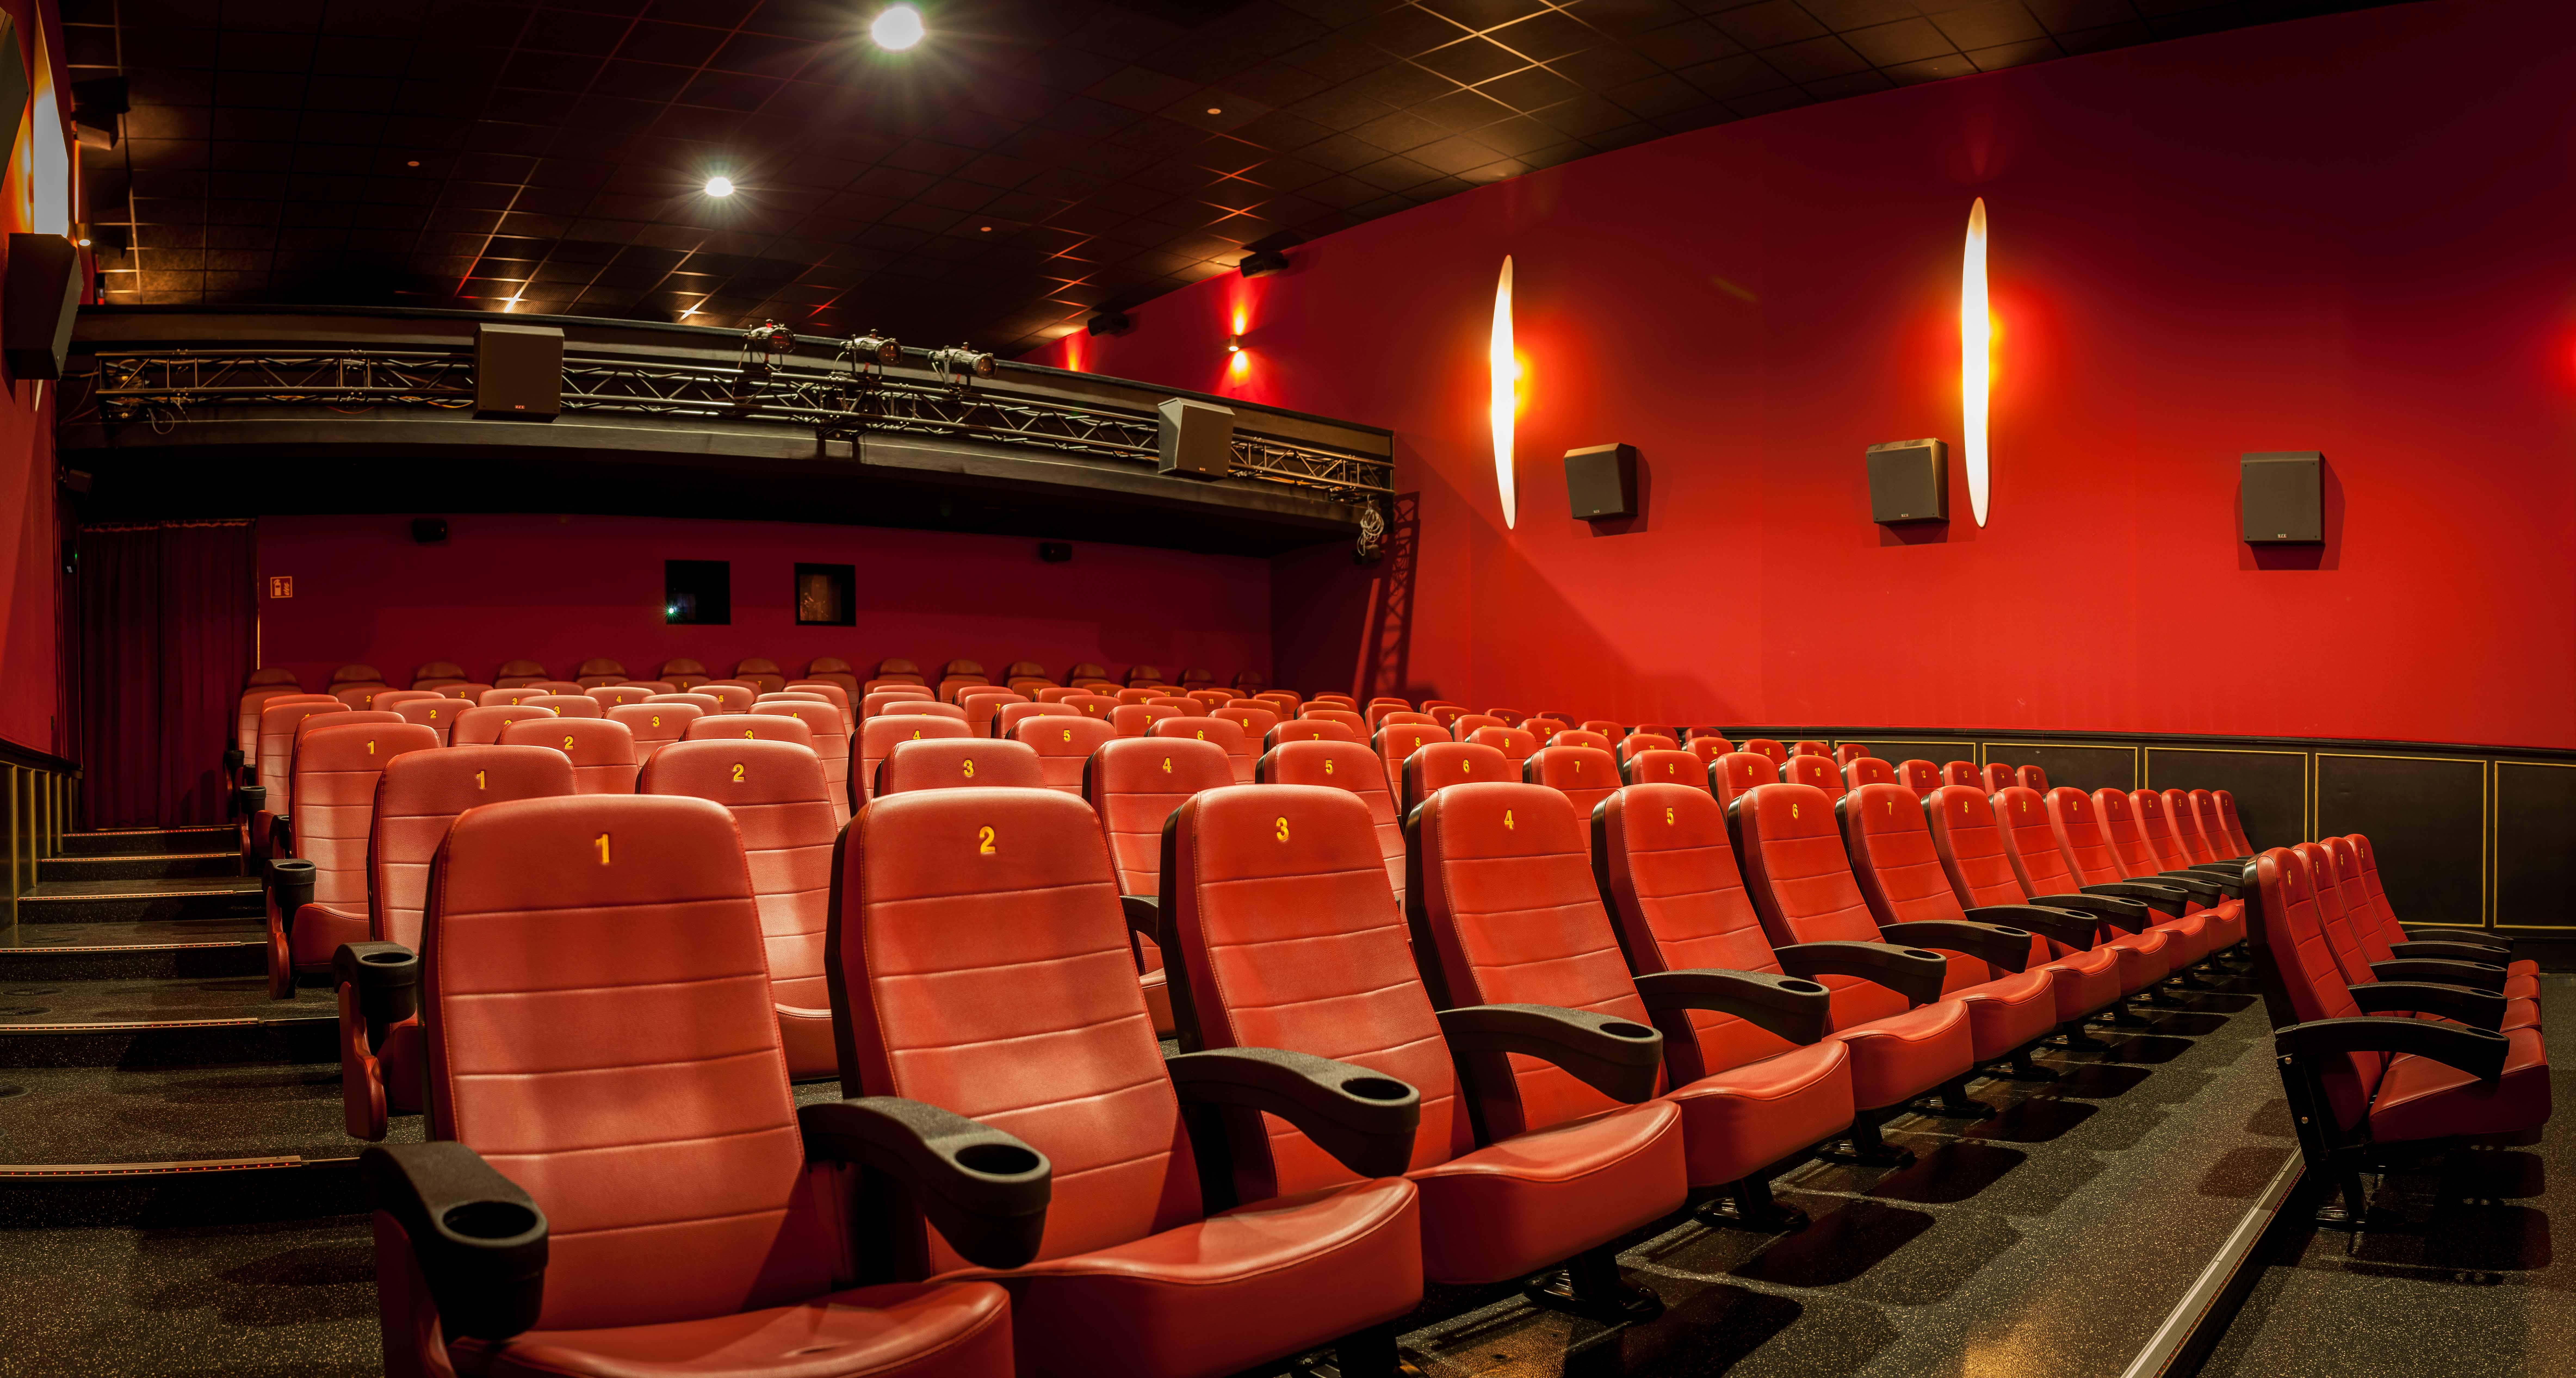 Kino In Weinheim